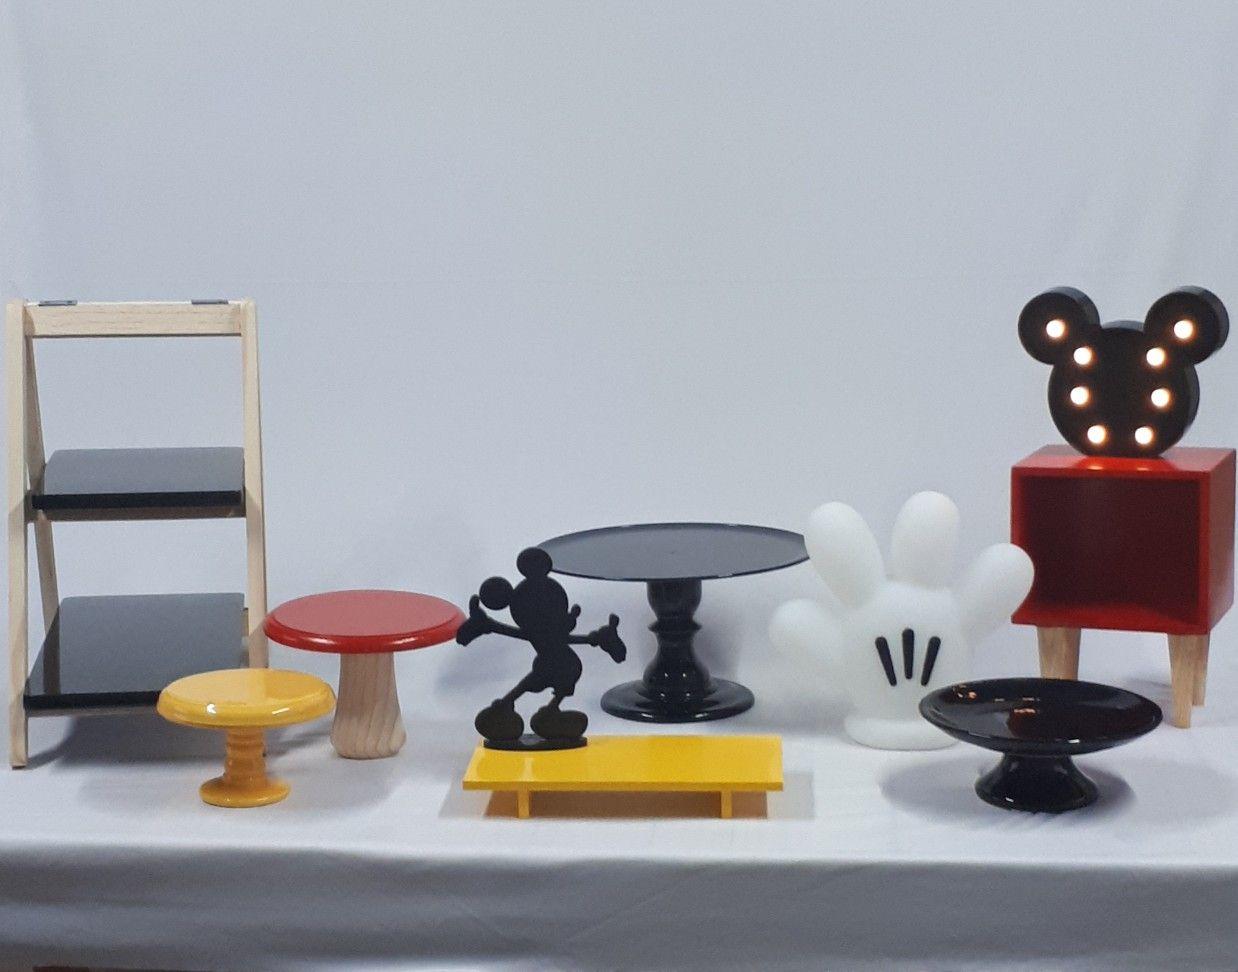 Kit Disponivel Para Locaca Sao Paulo Arte E Festa Decoracao Festa